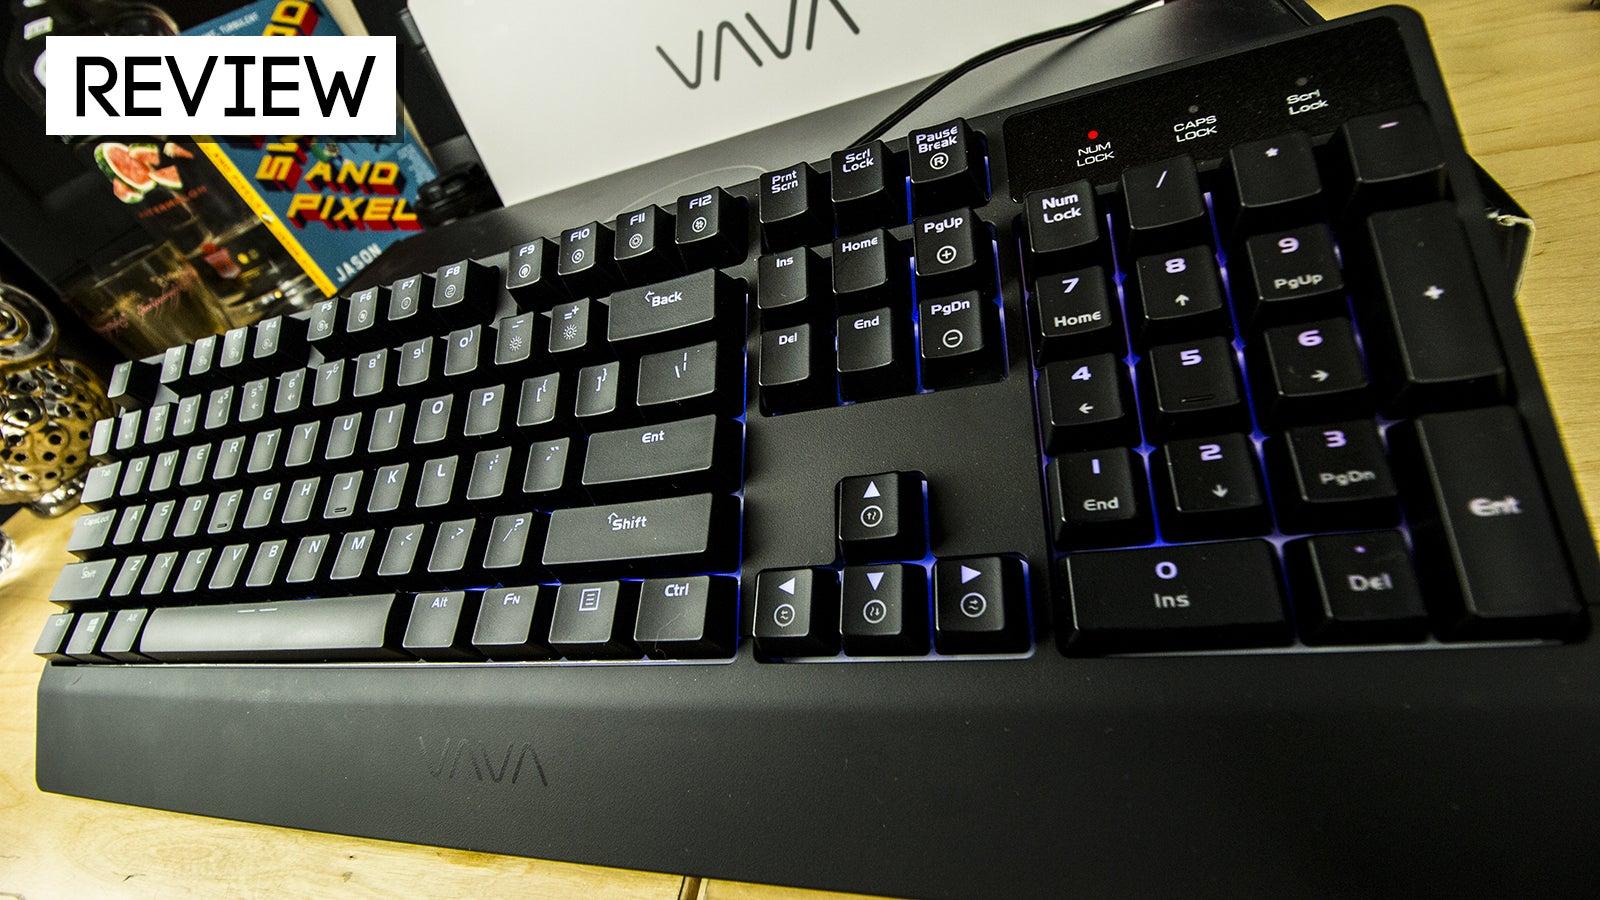 Vava Mechanical Gaming Keyboard: The Kotaku Review